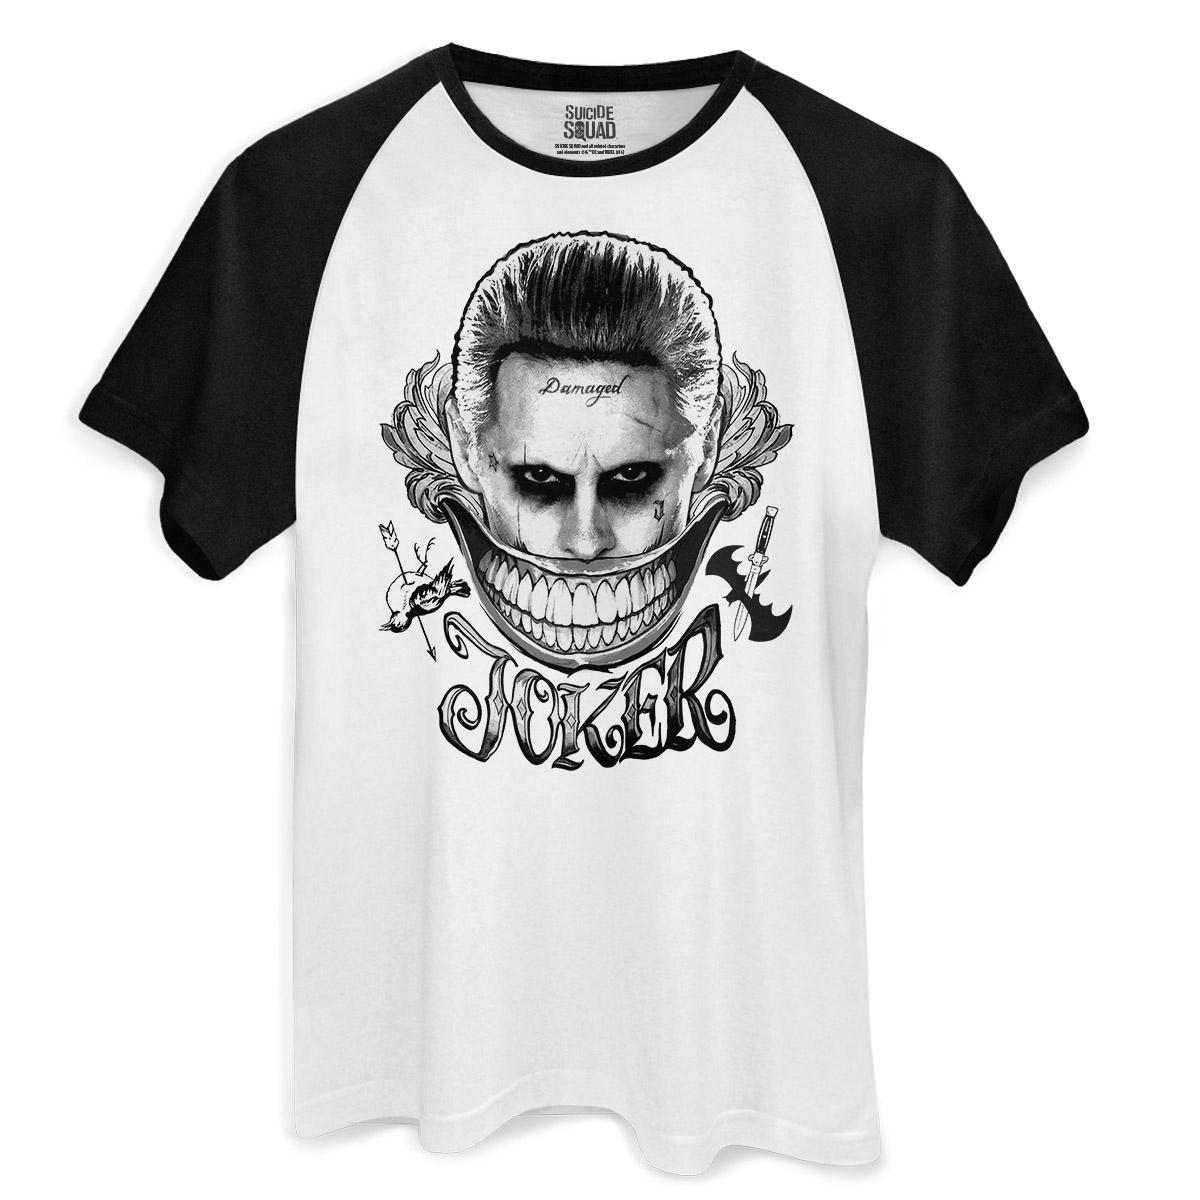 Camiseta Raglan Masculina Esquadrão Suicida The Joker Damaged  - bandUP Store Marketplace